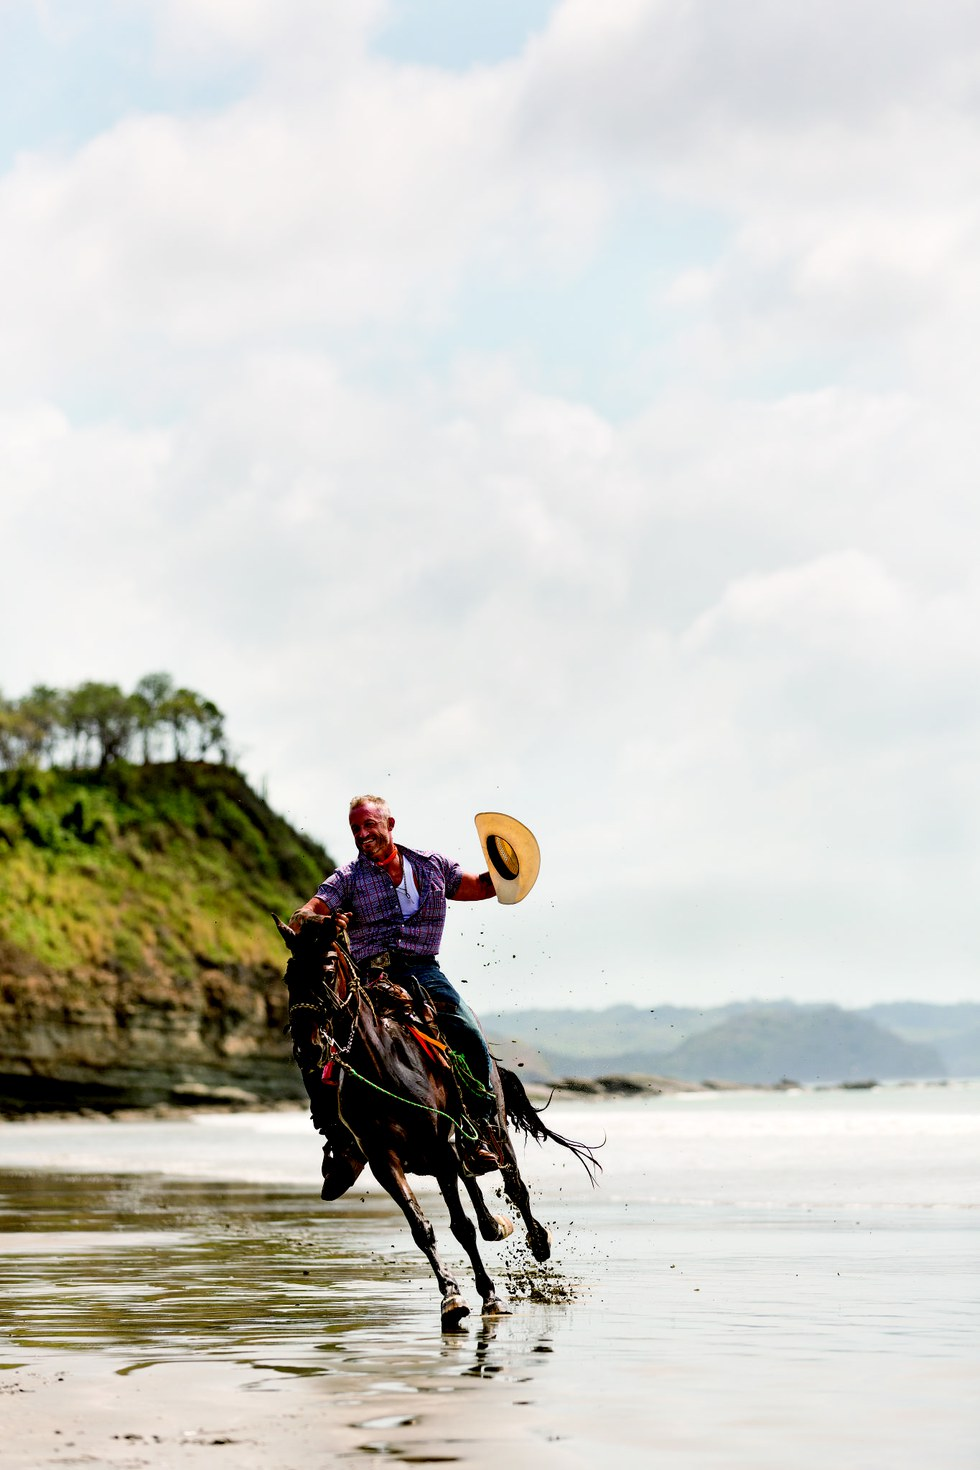 Nick Haven from Rancho Chilamate riding on Playa El Yankee